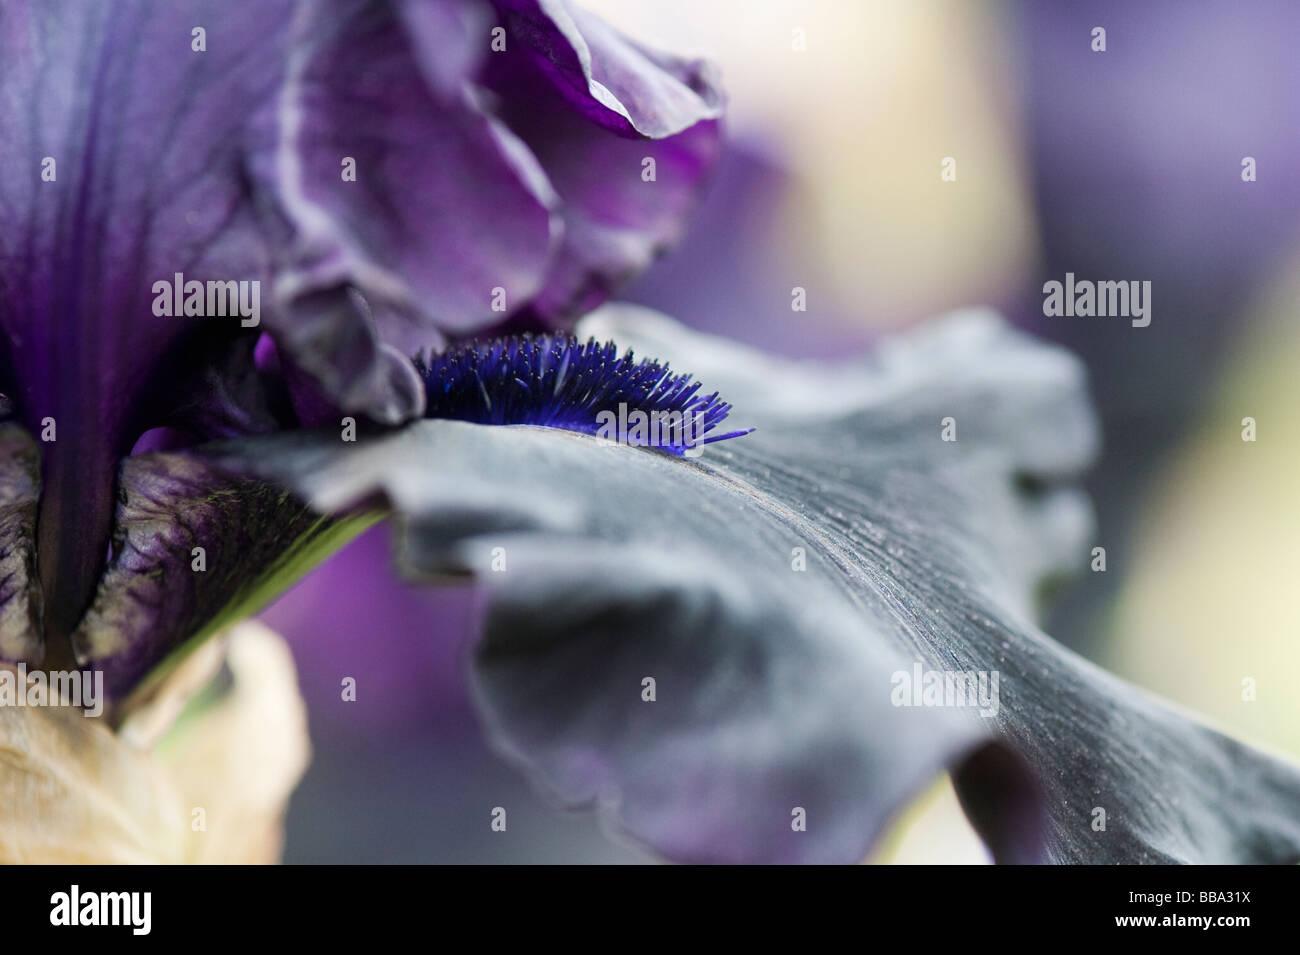 Bearded iris 'hello darkness' flower - Stock Image